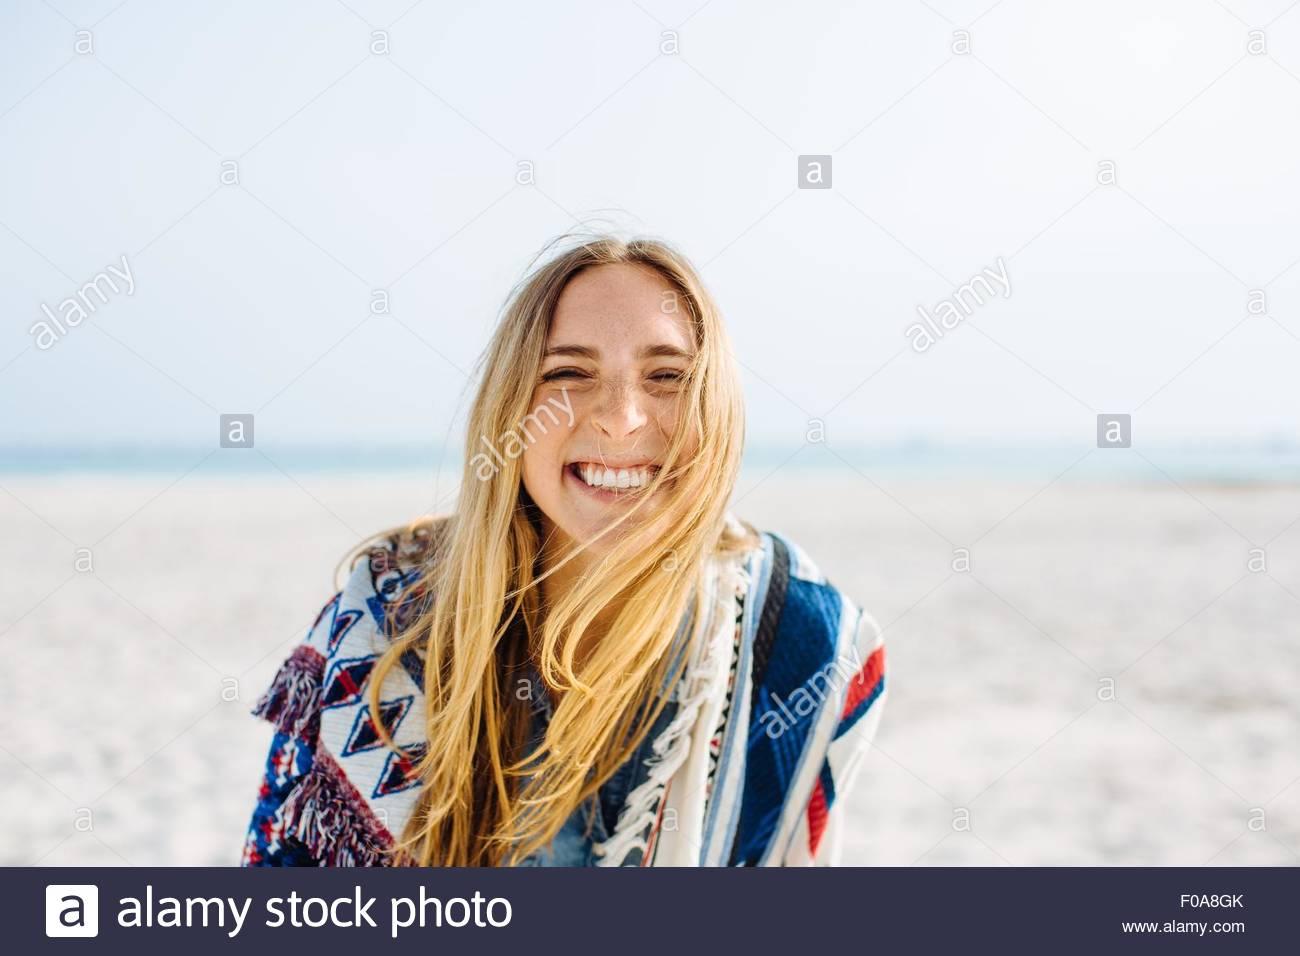 Porträt der jungen Frau in Smiley Gesicht am Strand Decke gehüllt Stockbild